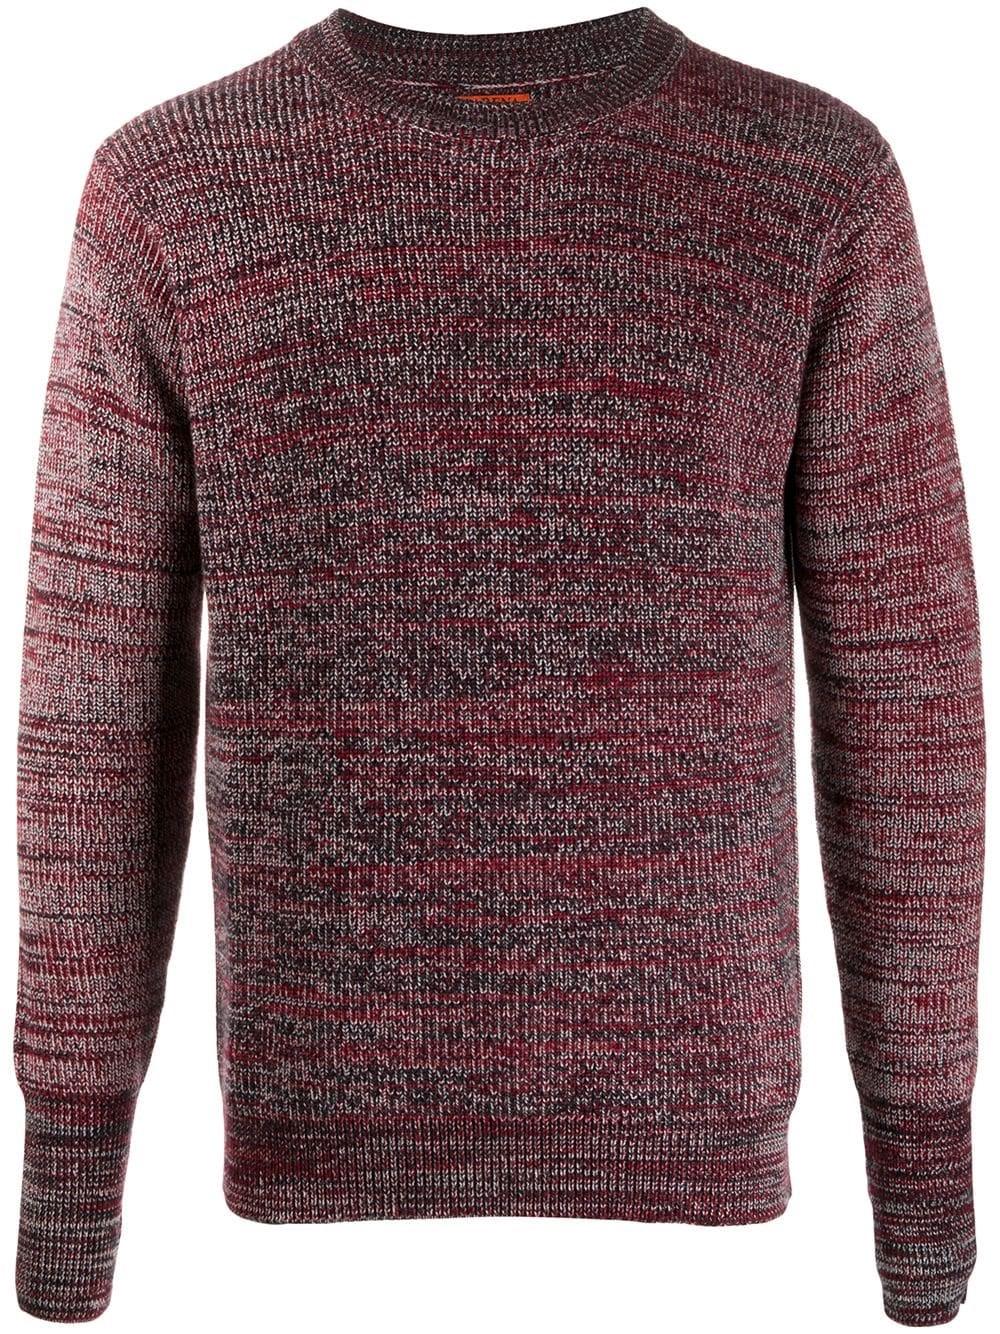 BARENA VENEZIA Wool Knit Crewneck Sweater